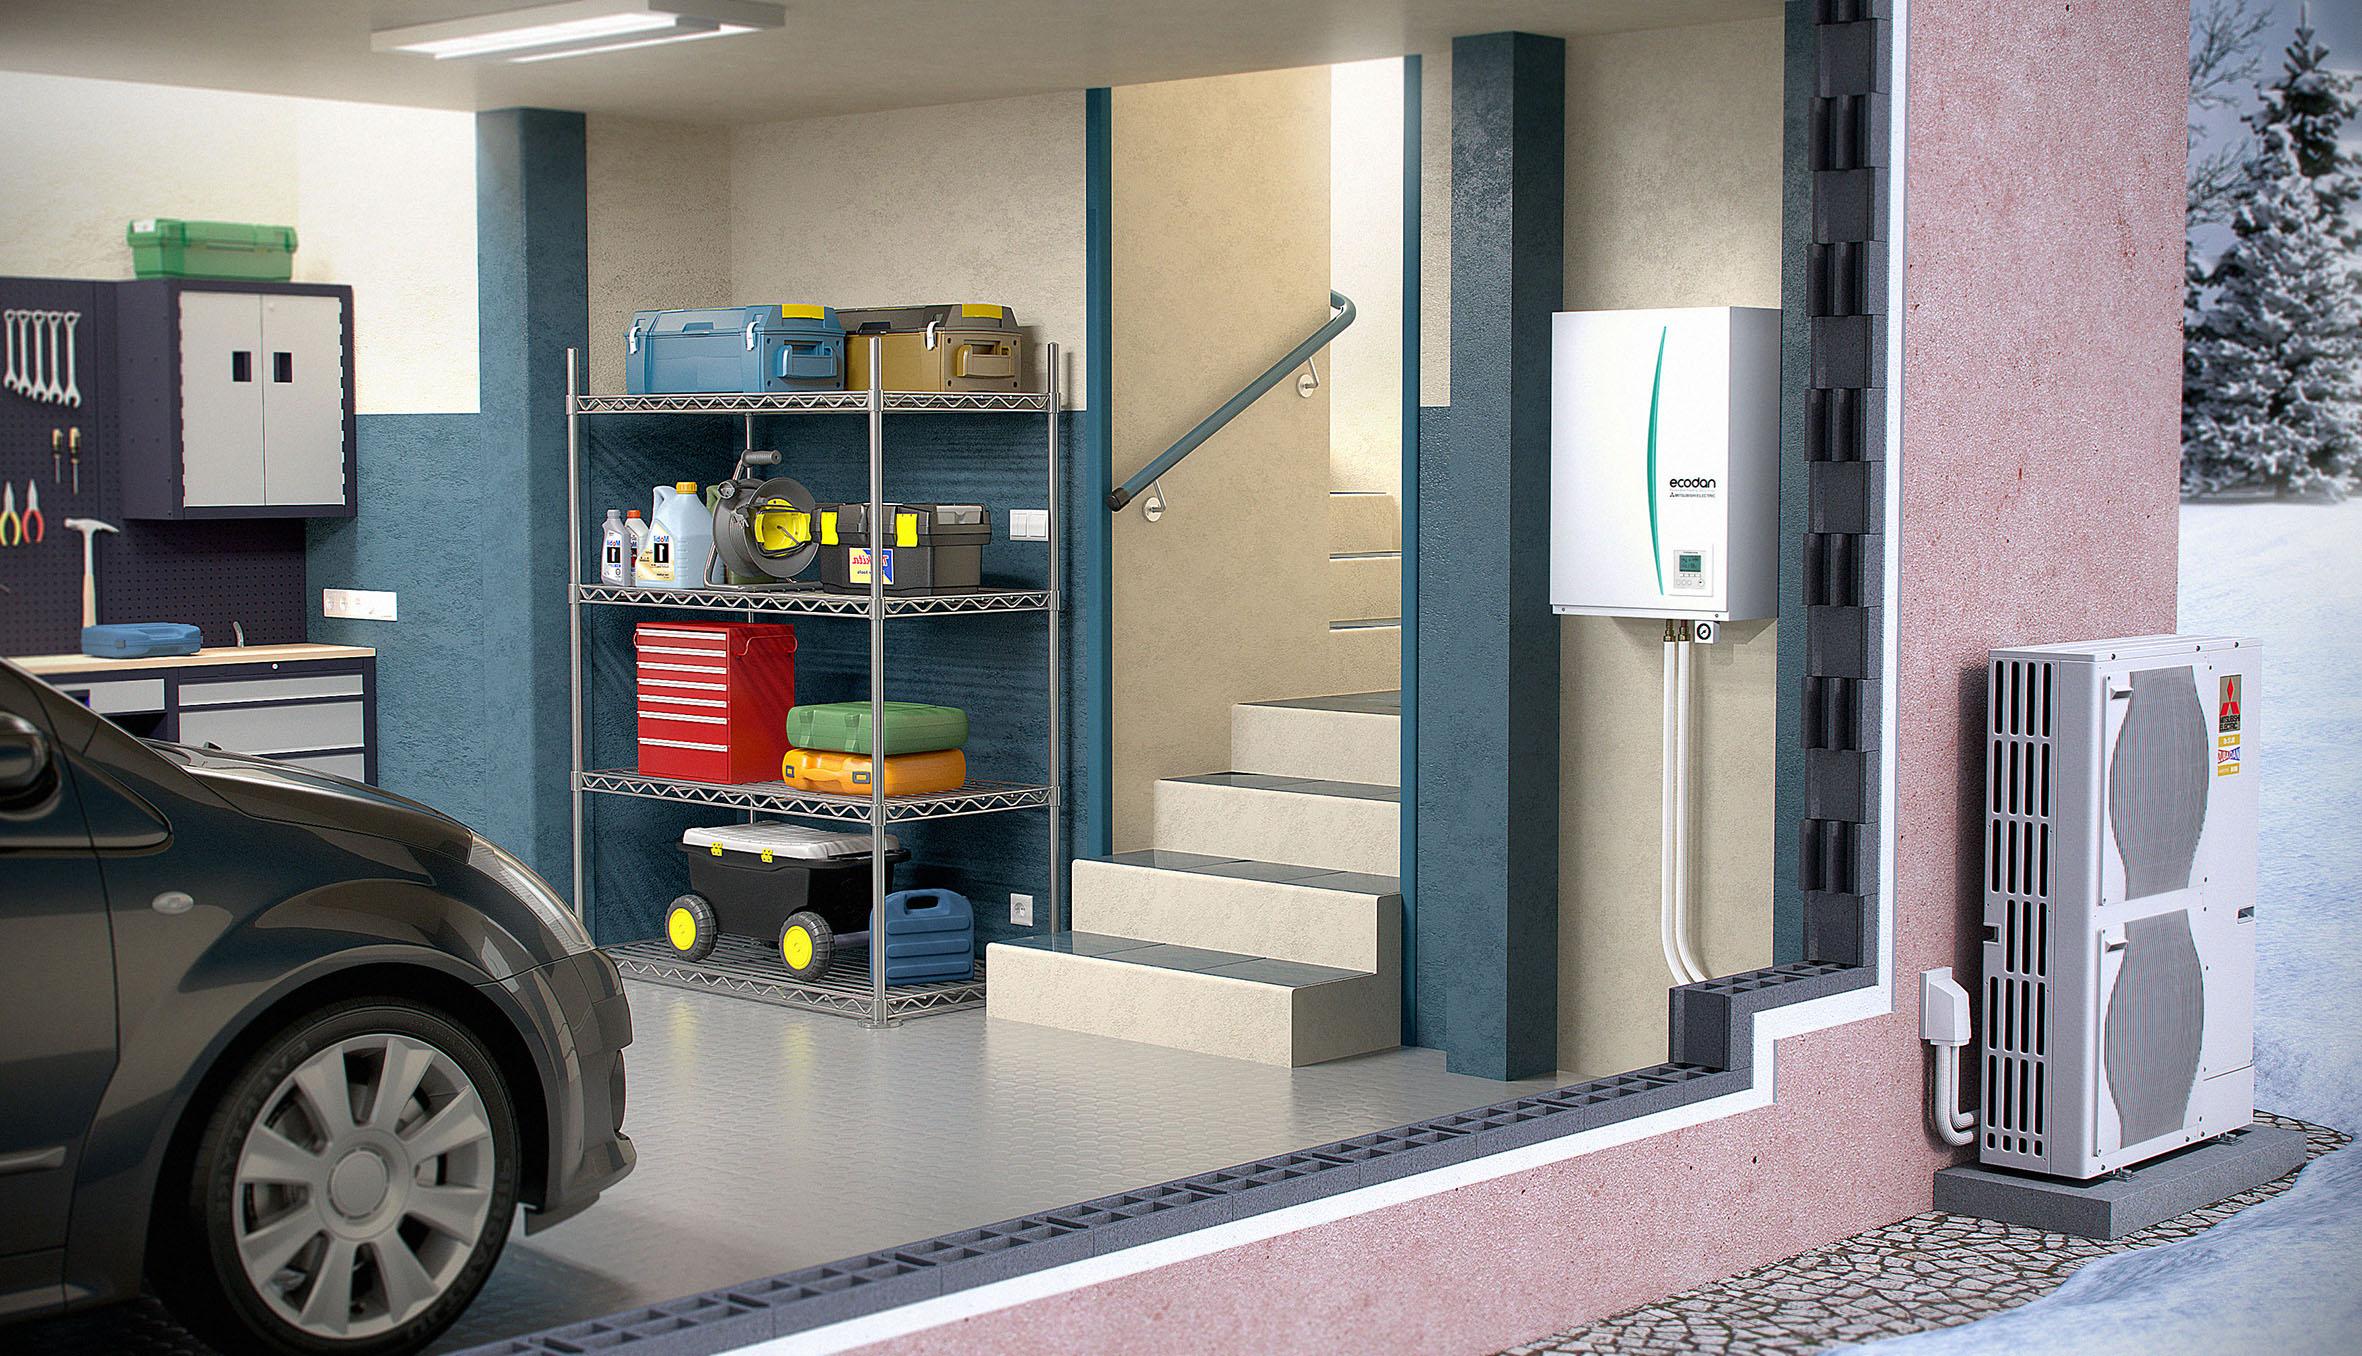 entretien pompe chaleur gap brian on et manosque. Black Bedroom Furniture Sets. Home Design Ideas